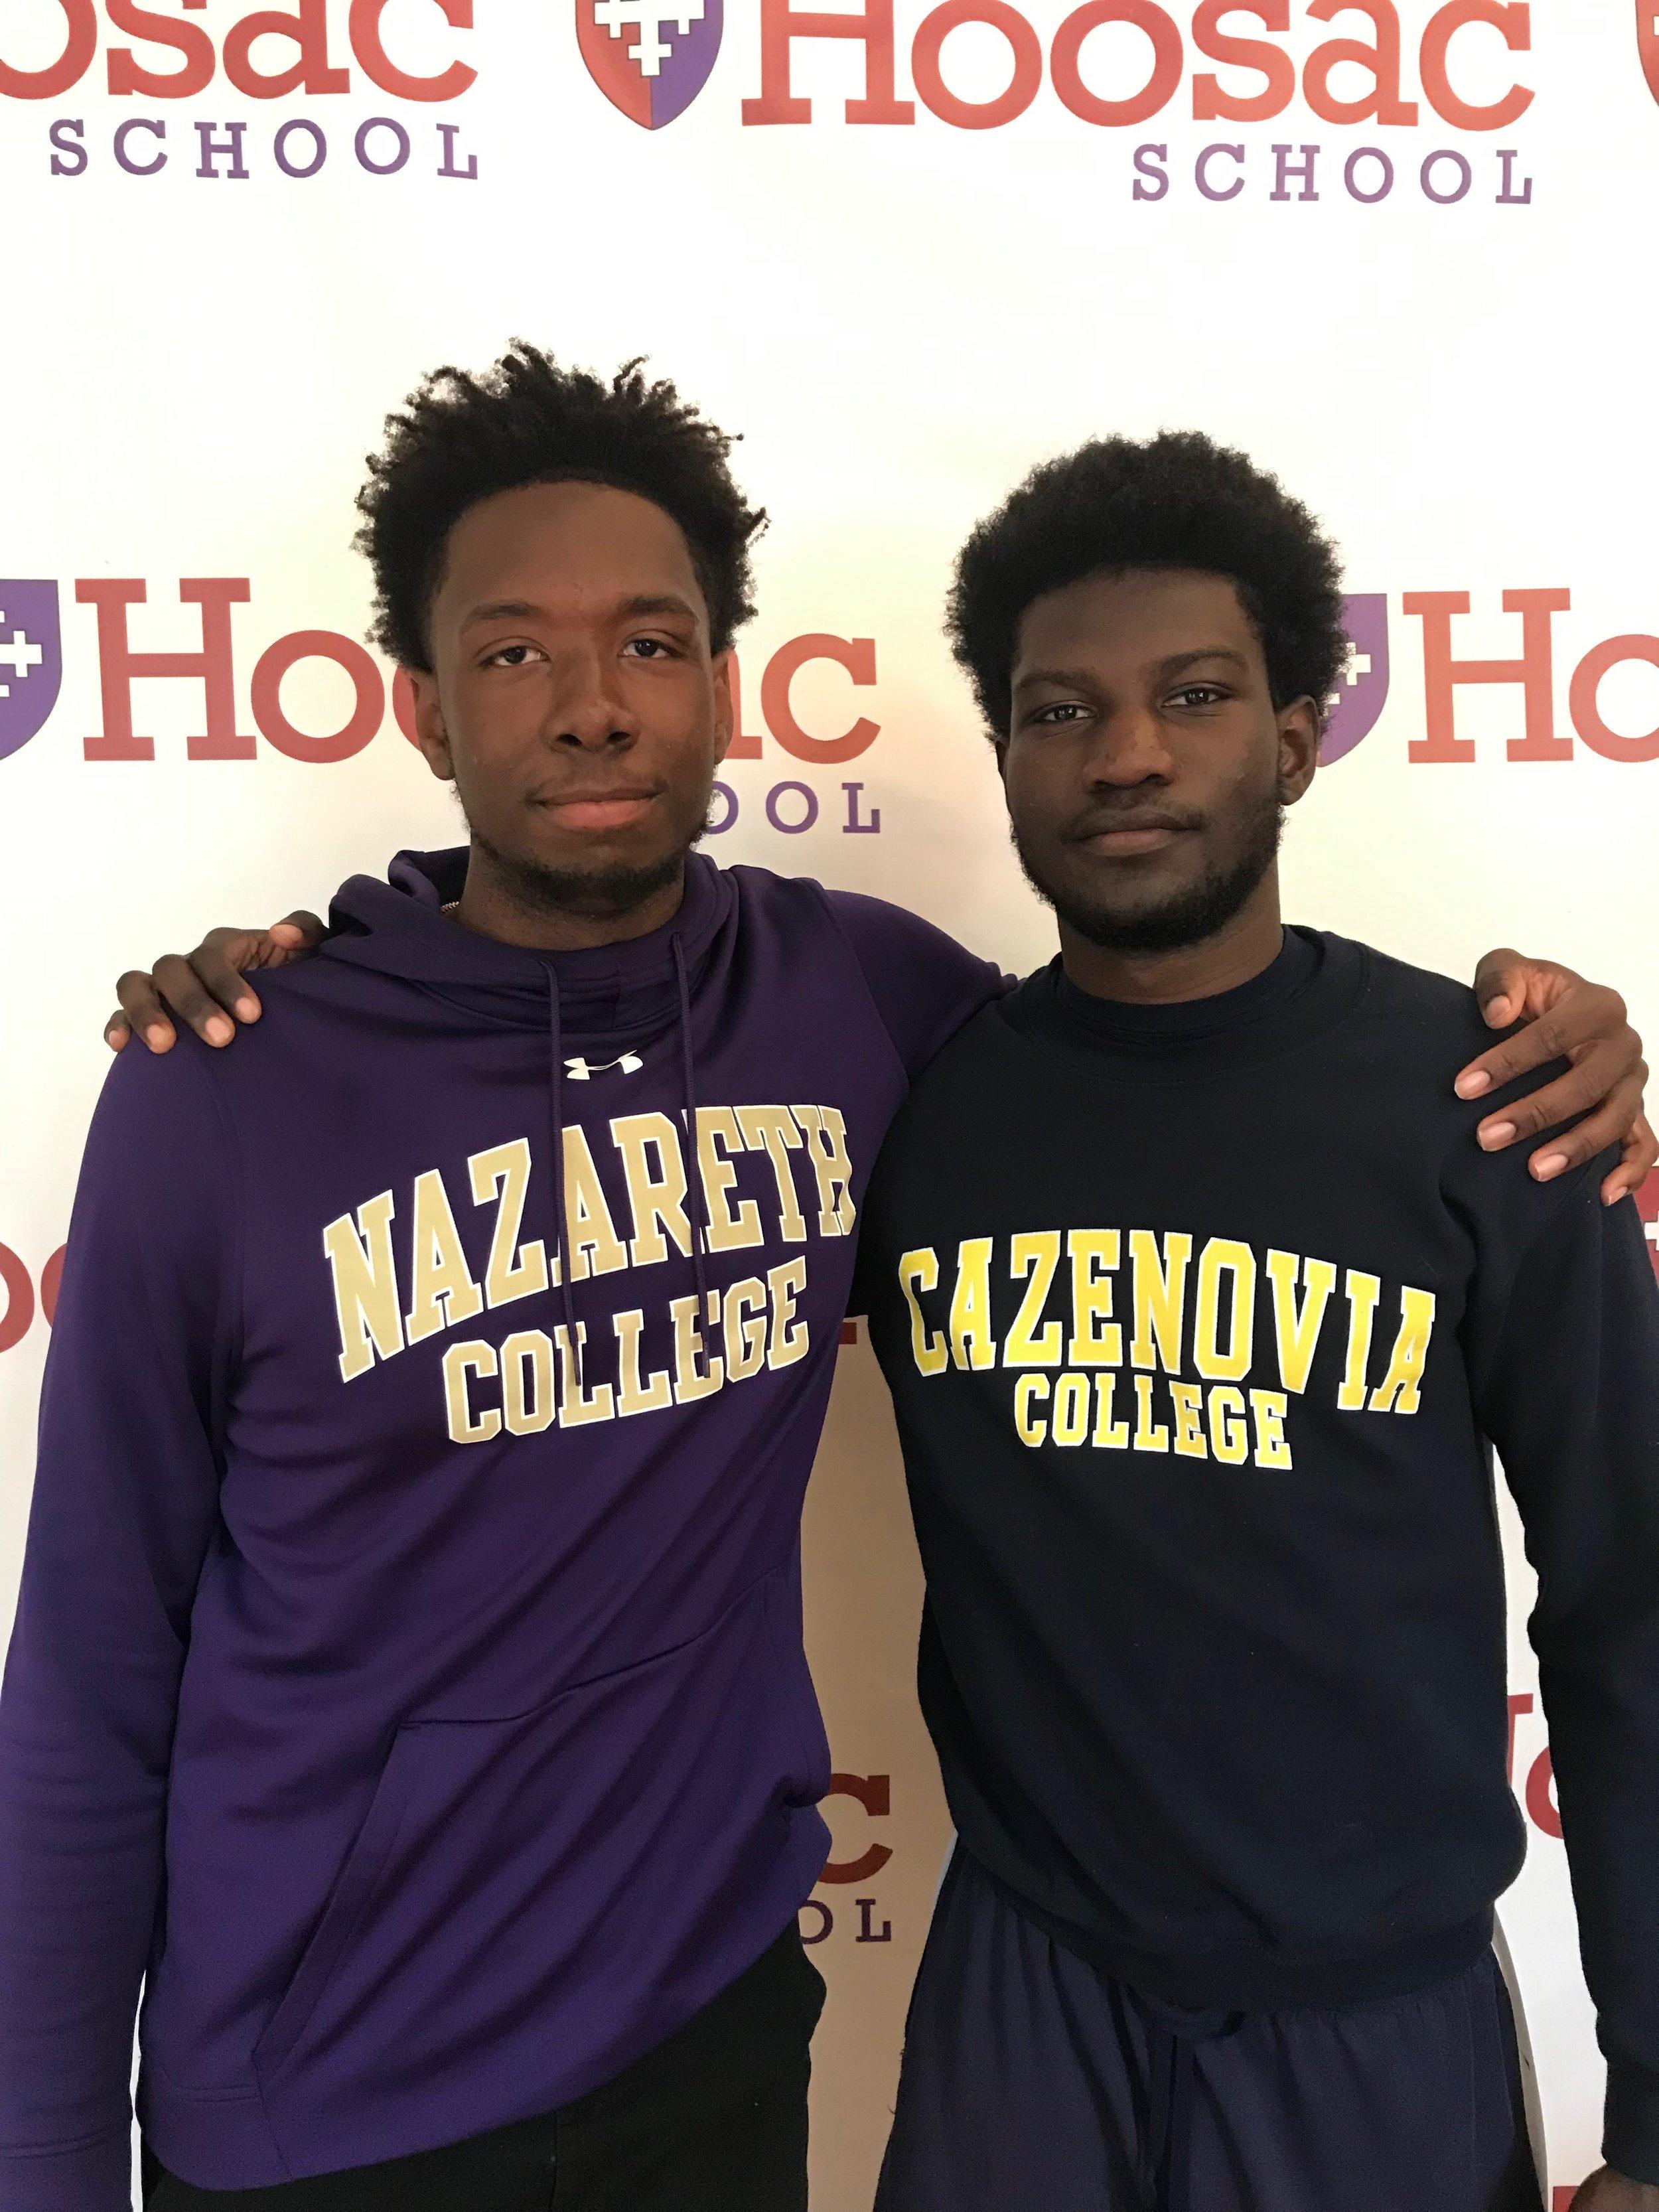 Clifford and Bernard College Shirts.jpeg